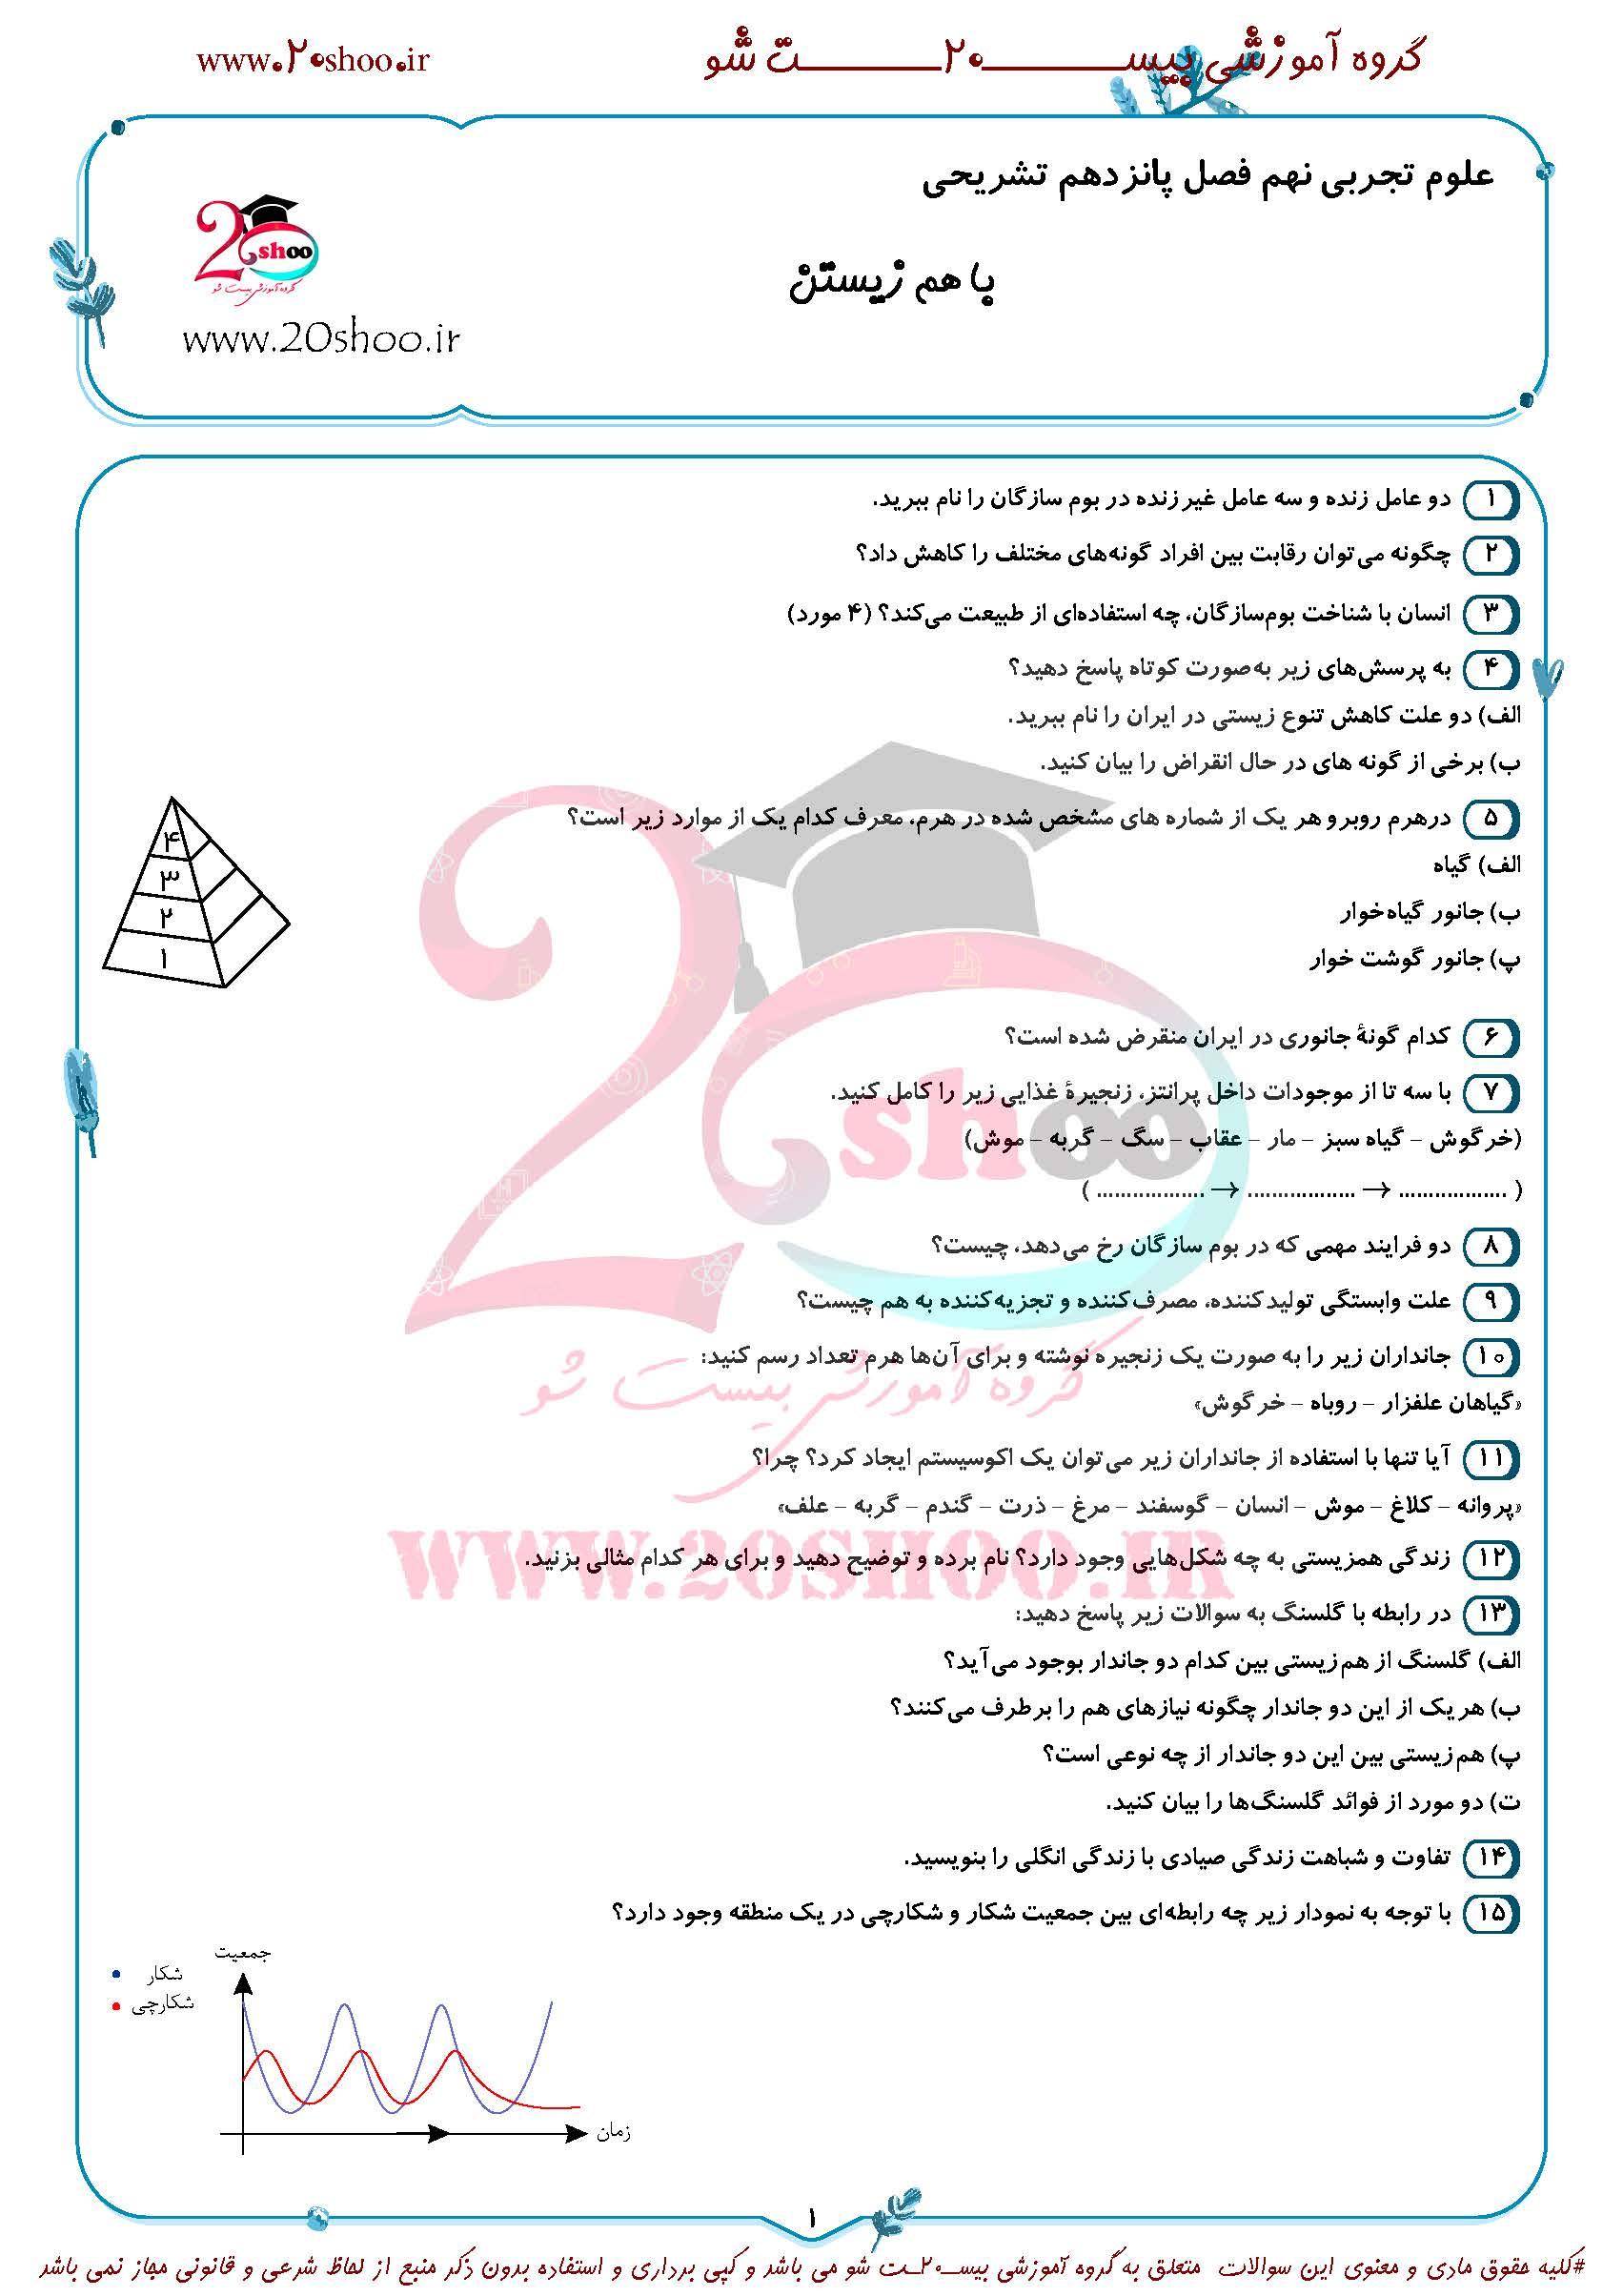 سوال علوم نهم فصل 15